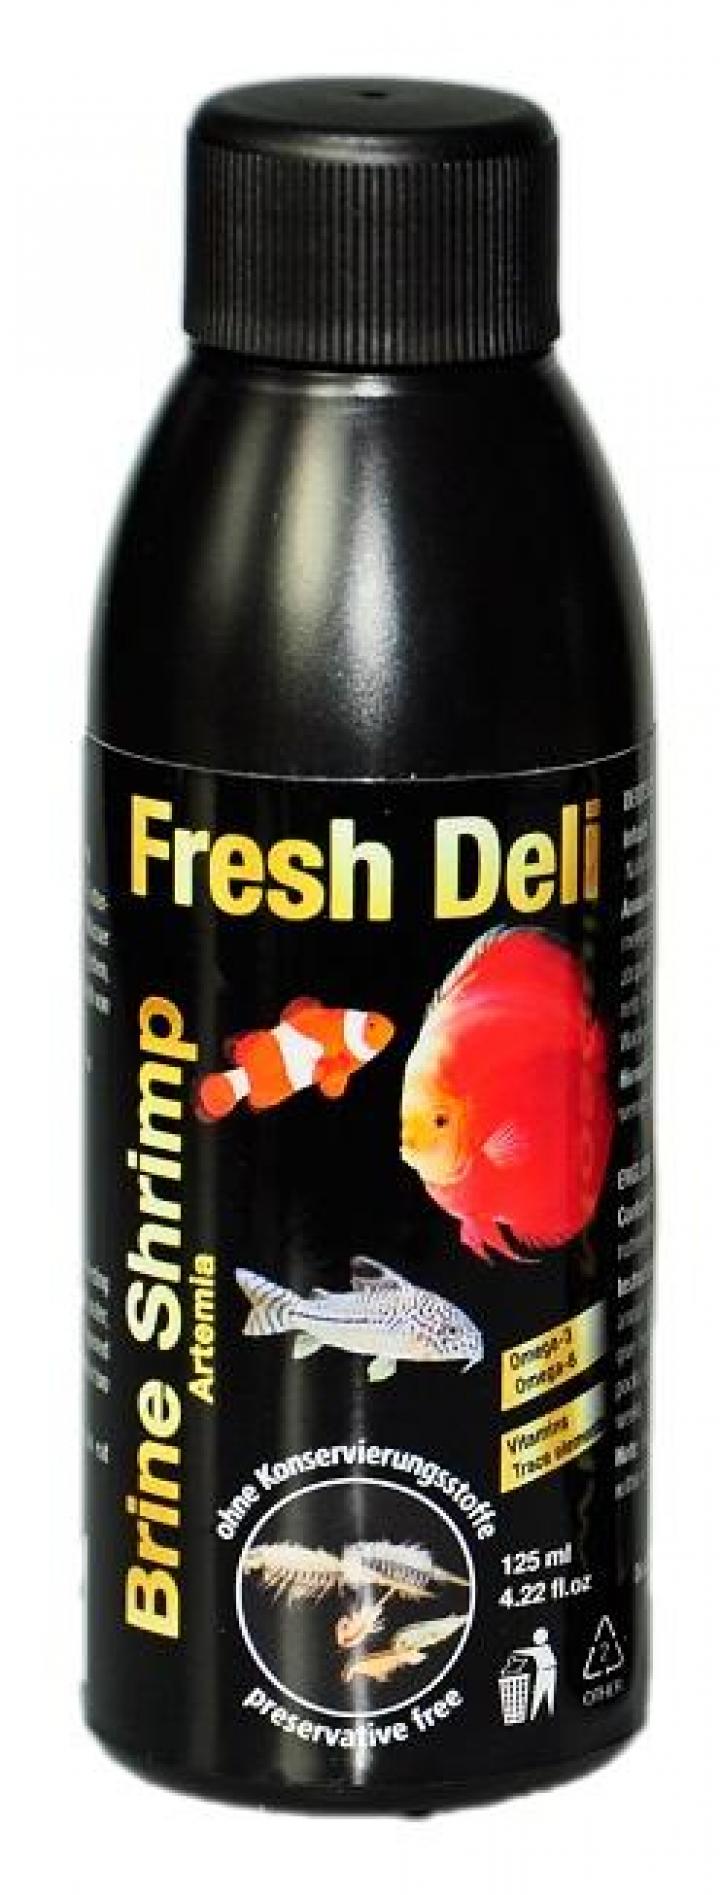 Discusfood Fresh Deli, Brine Shrimp (Artemia) in nutrient solution 125ml